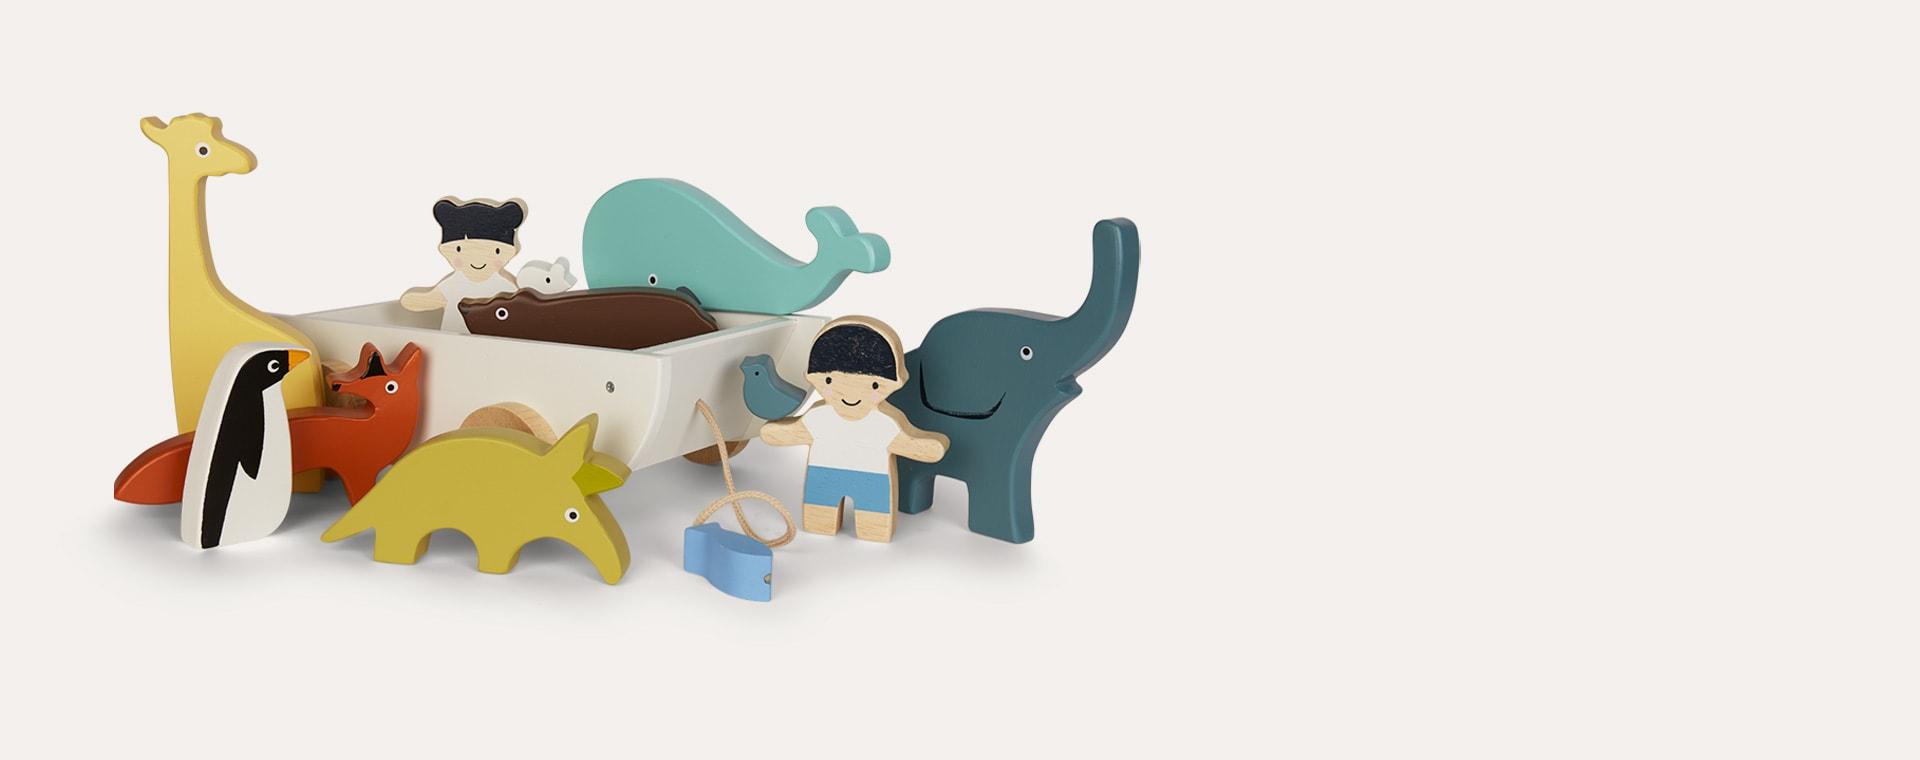 Multi Tender Leaf Toys The Friend Ship